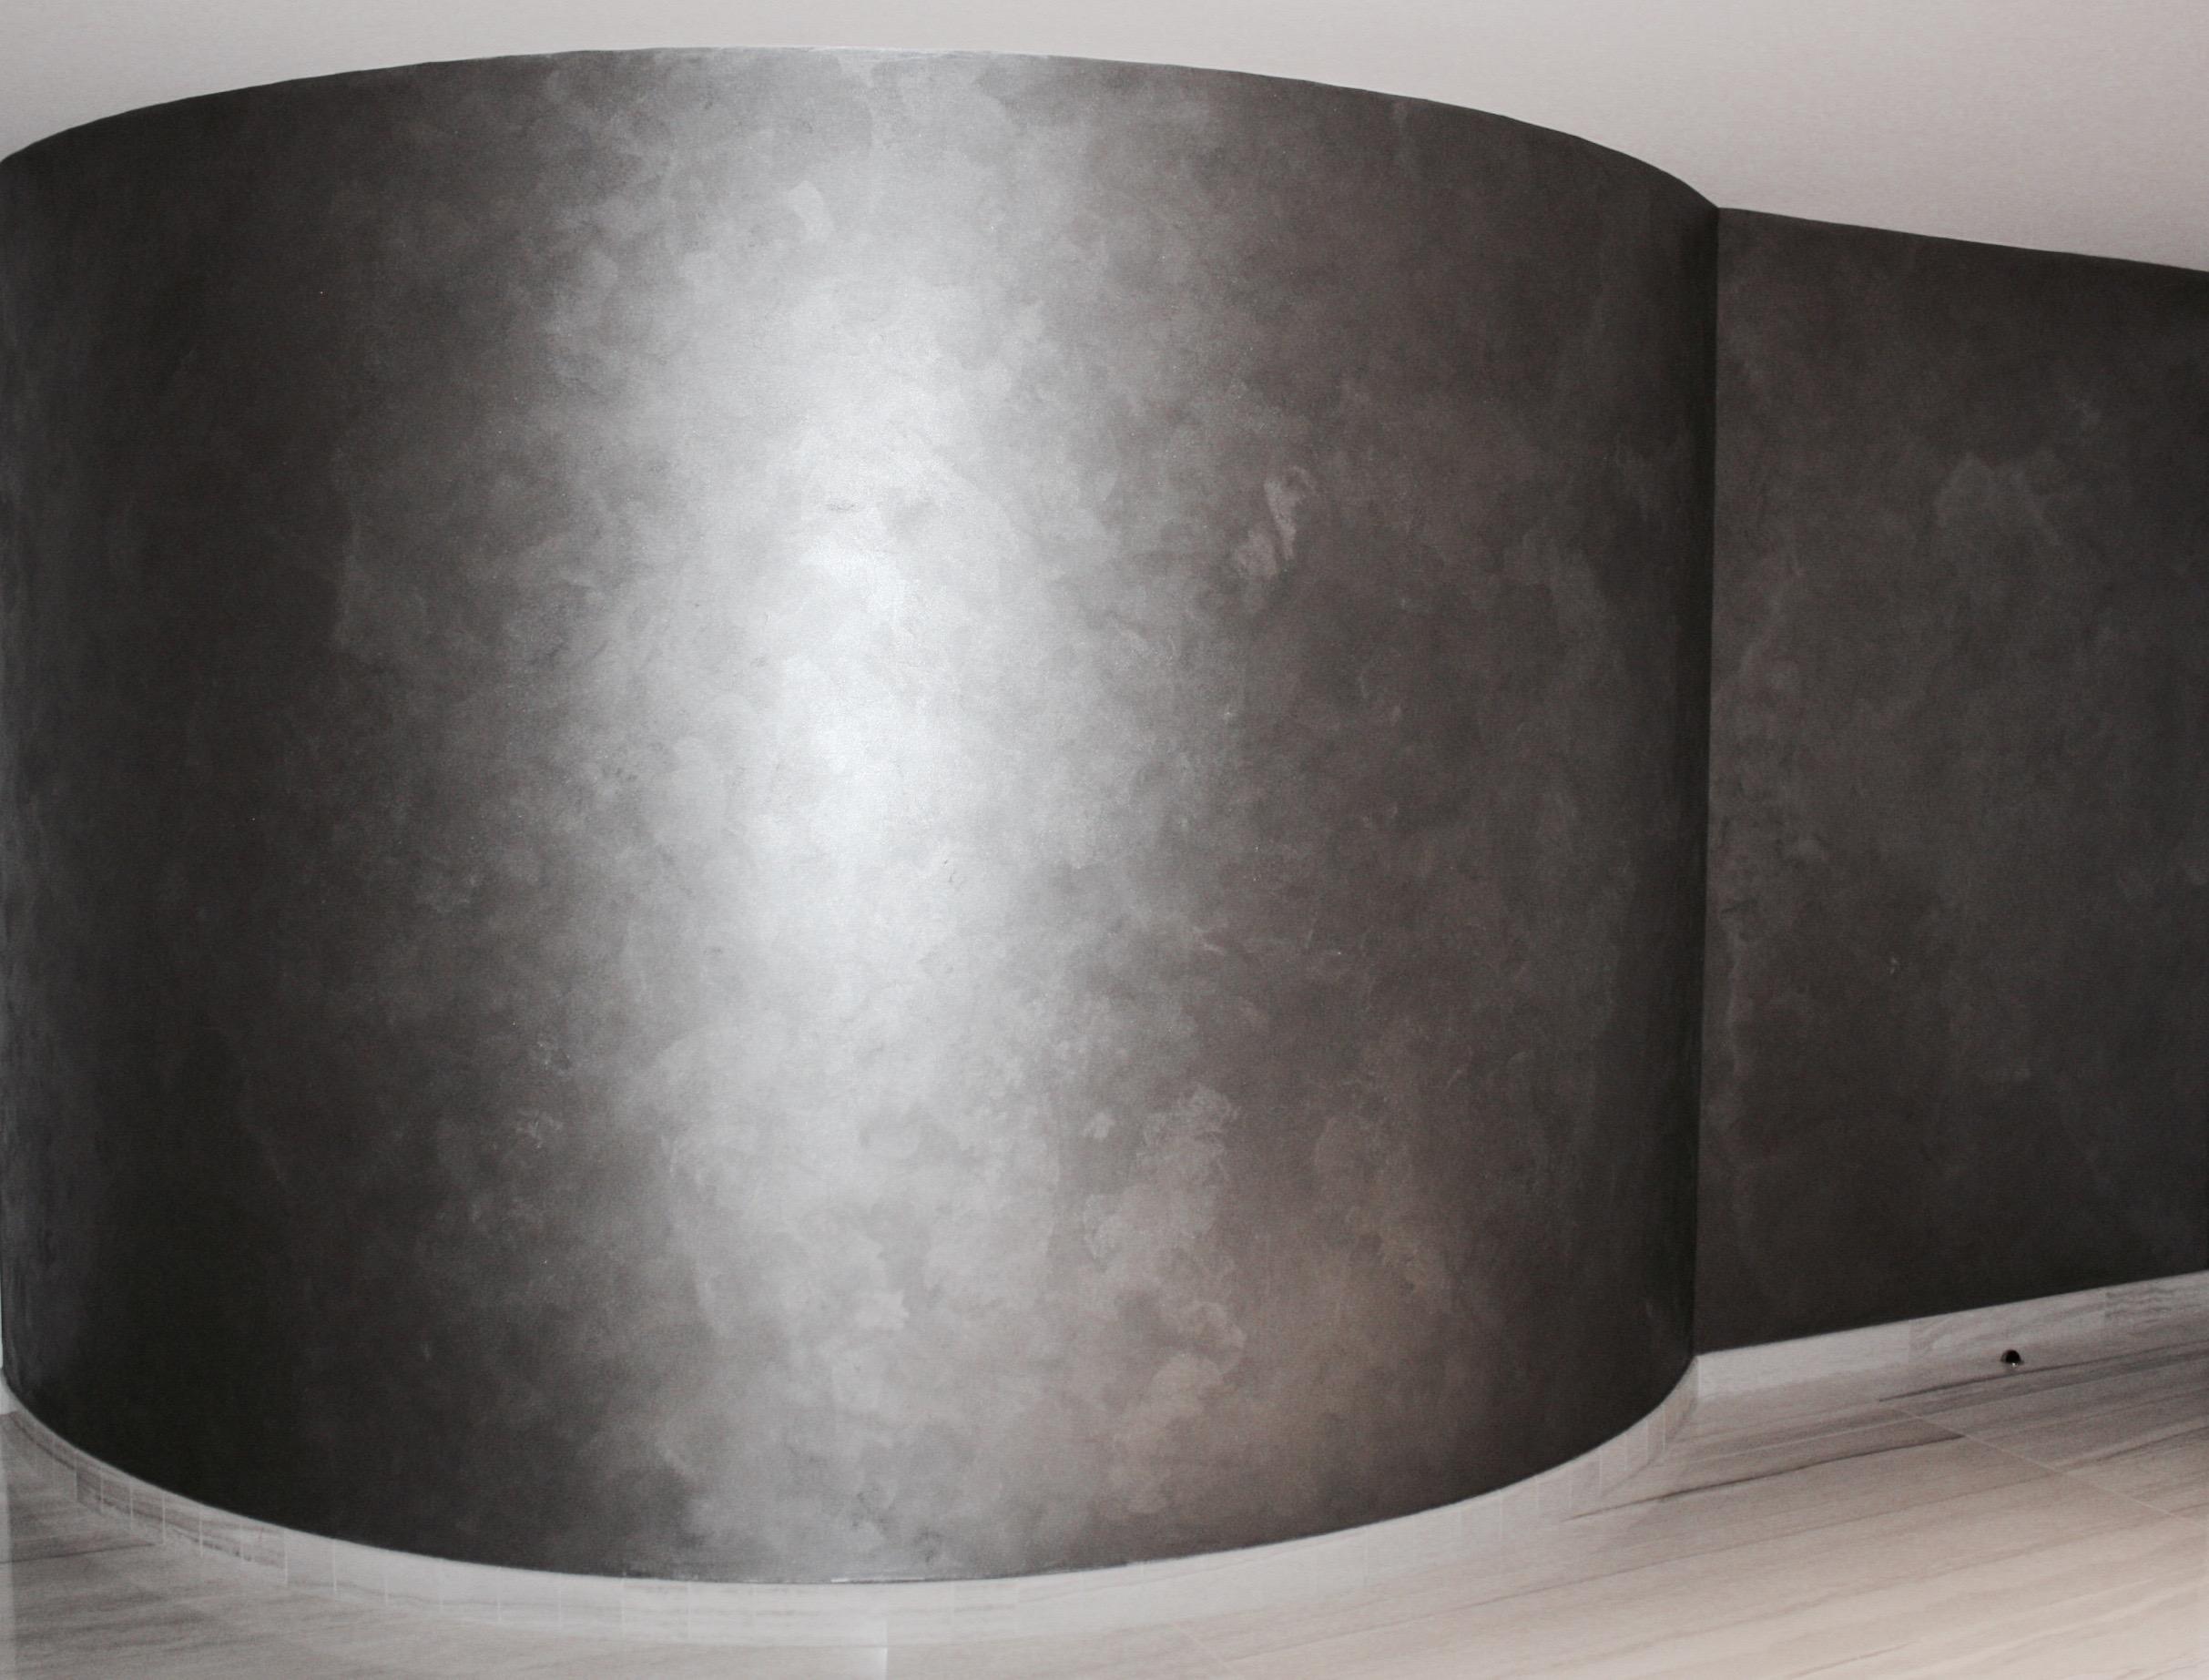 grey metallic textured bespoke dining room kitchen feature wall finish custom interiors jpg.jpg